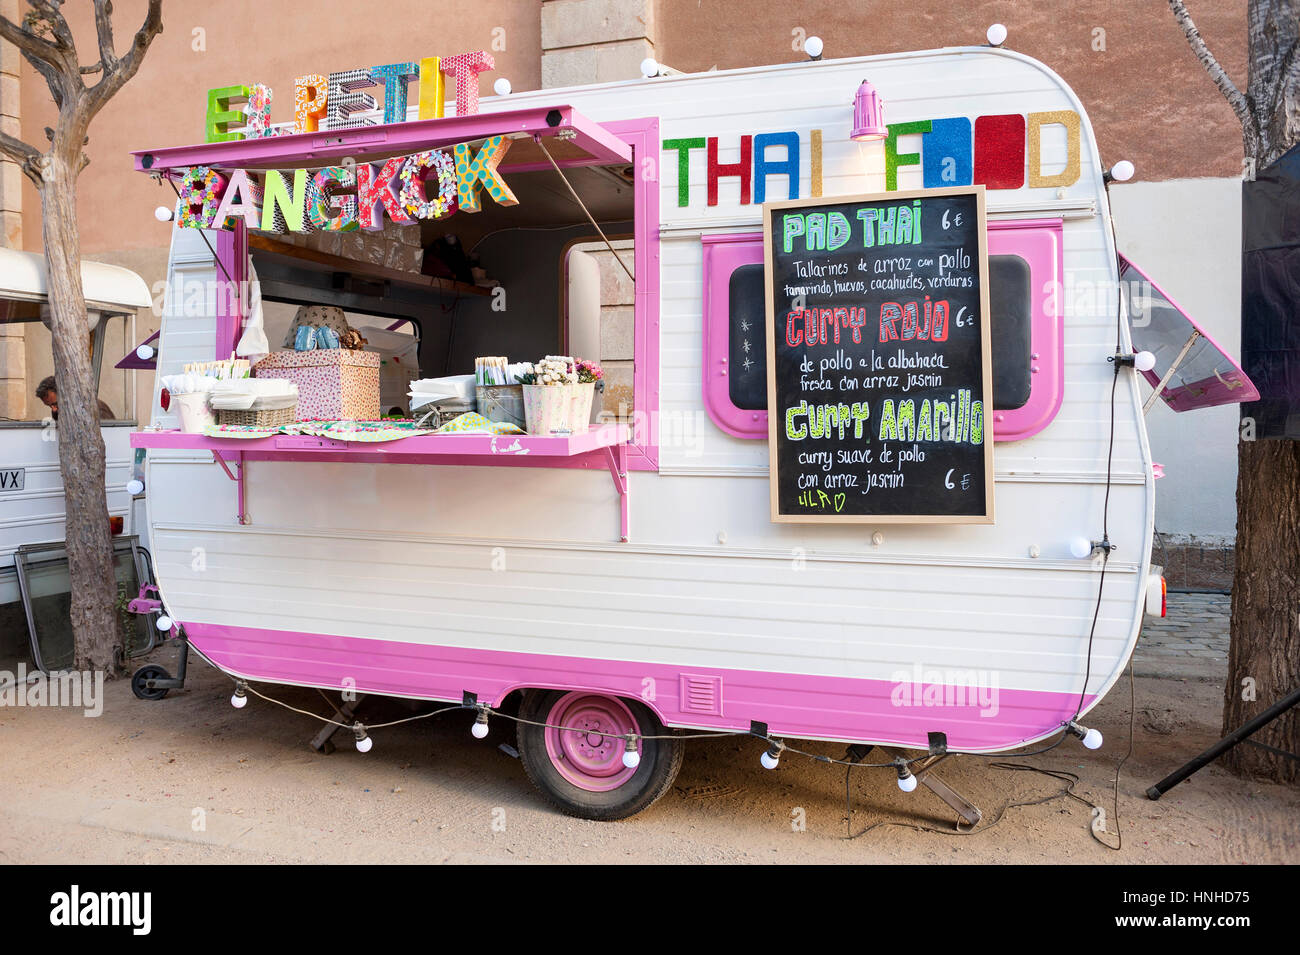 Food Truck El Petit Bangkok - Stock Image